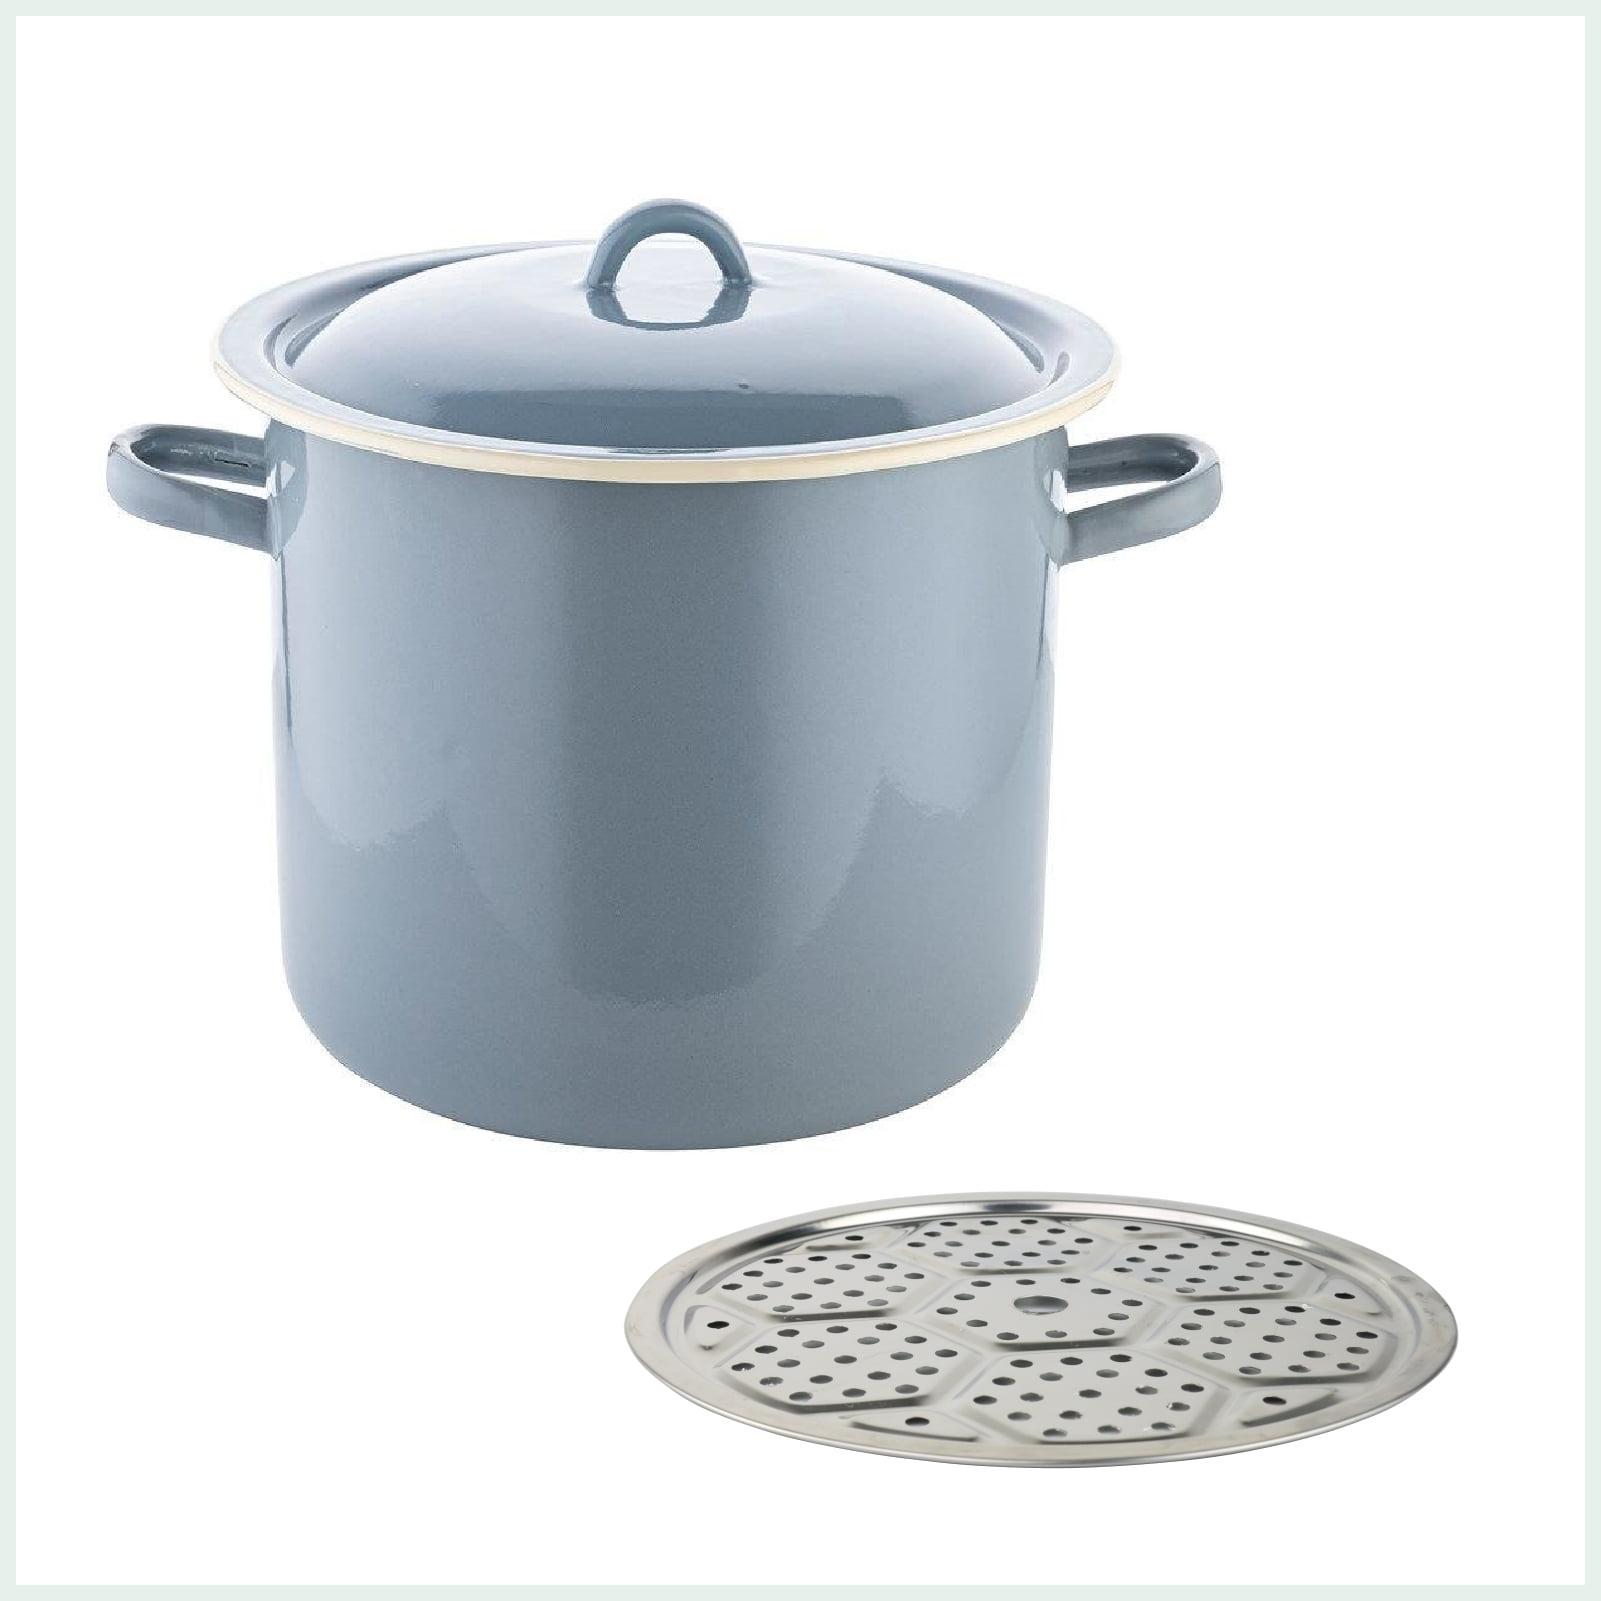 15-litre-enamel-water-bath-canner-set-with-rack-trivet-blue